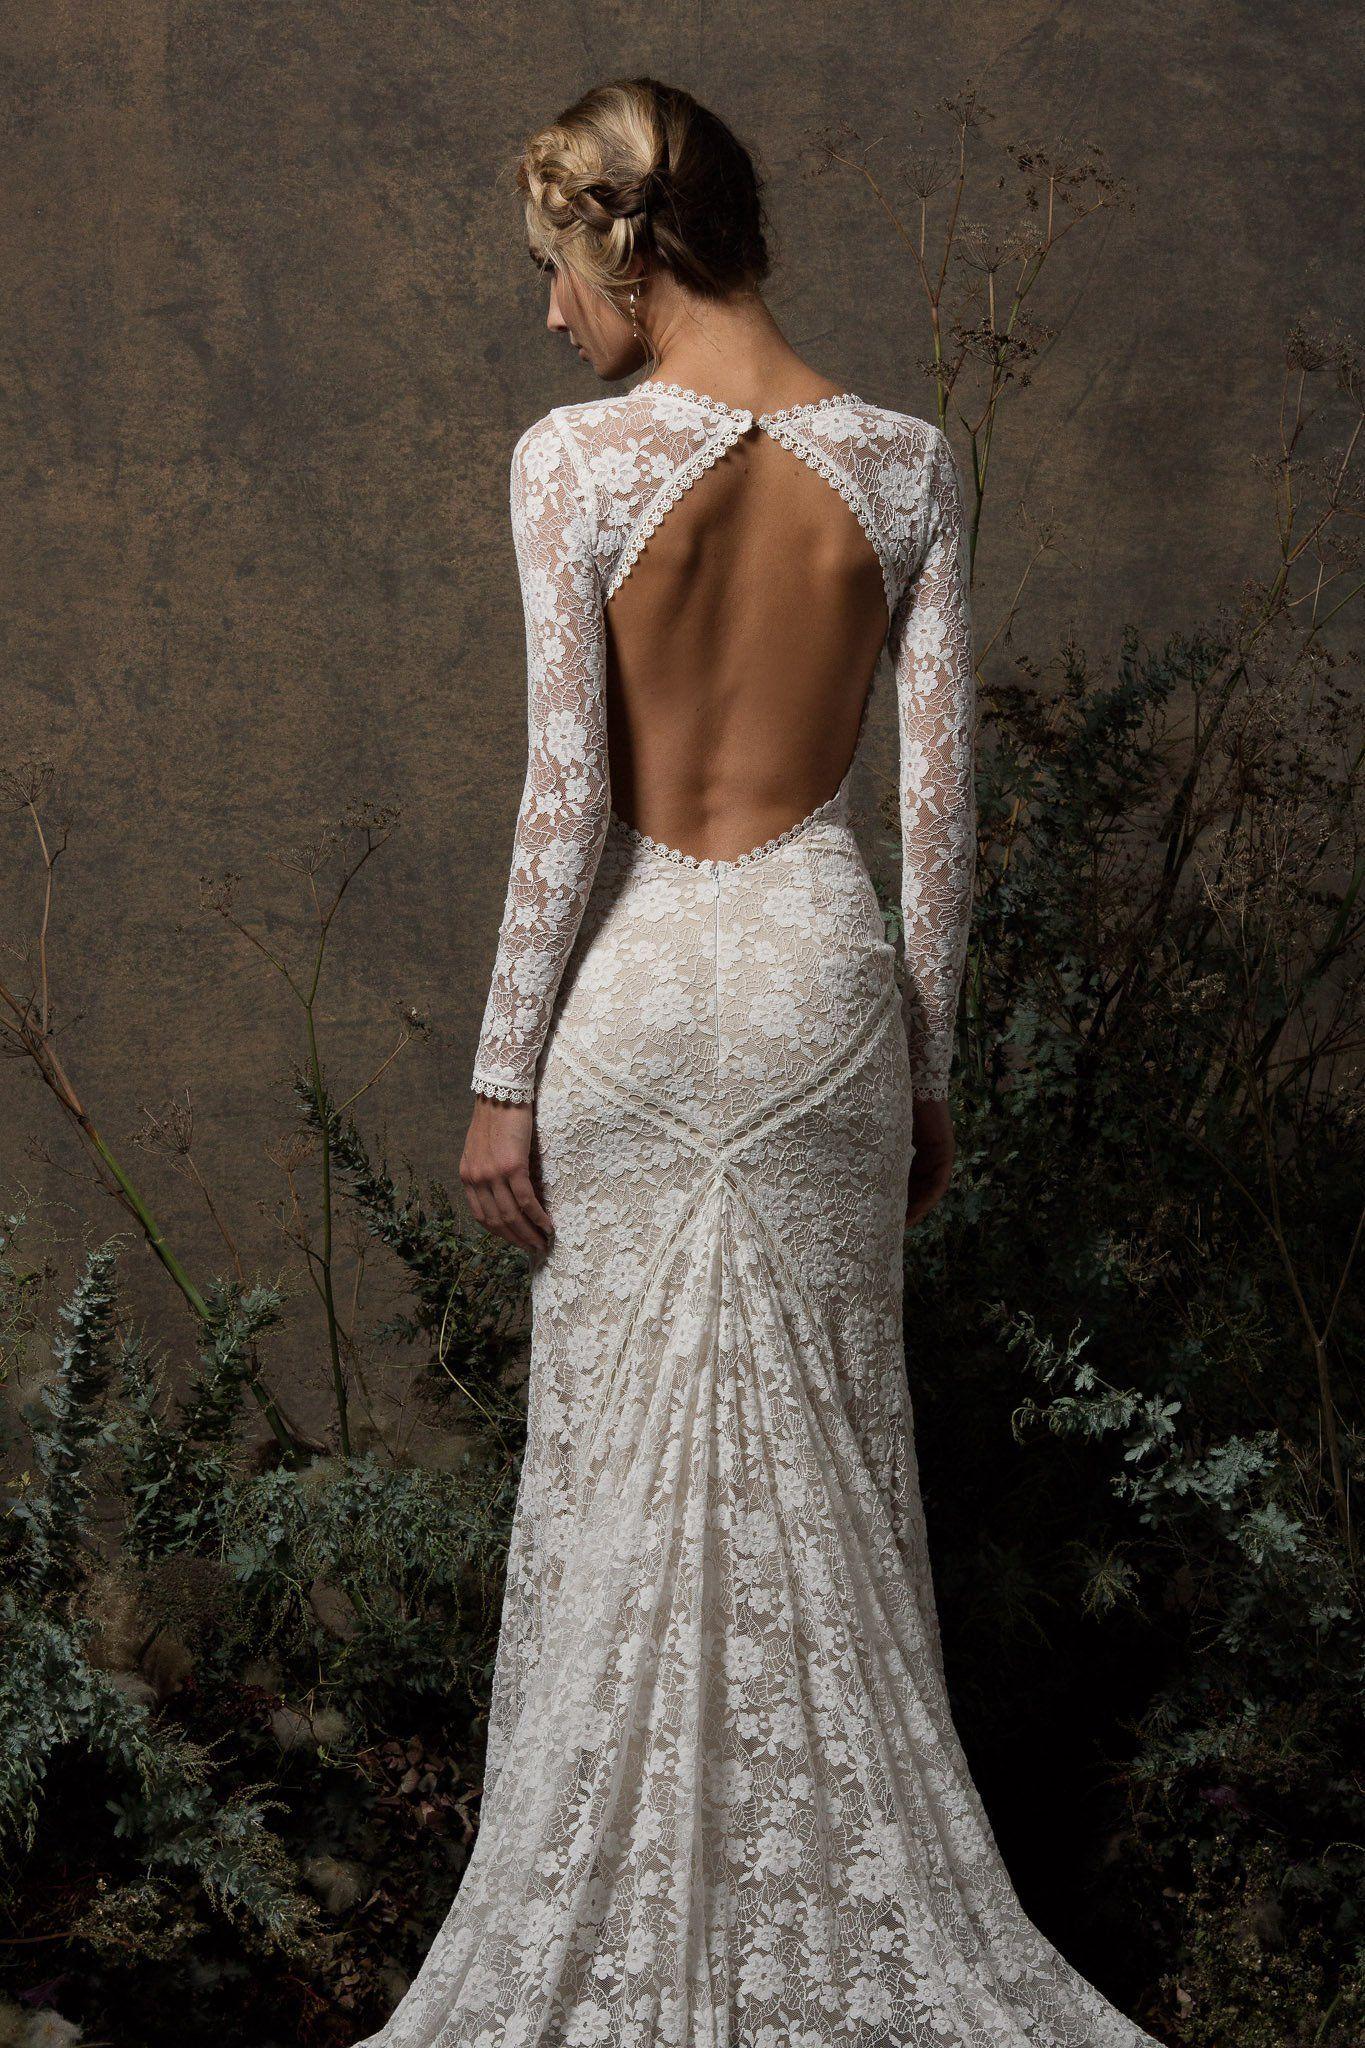 Valentina Backless Lace Dress Pretty Dresses Pinterest Wedding